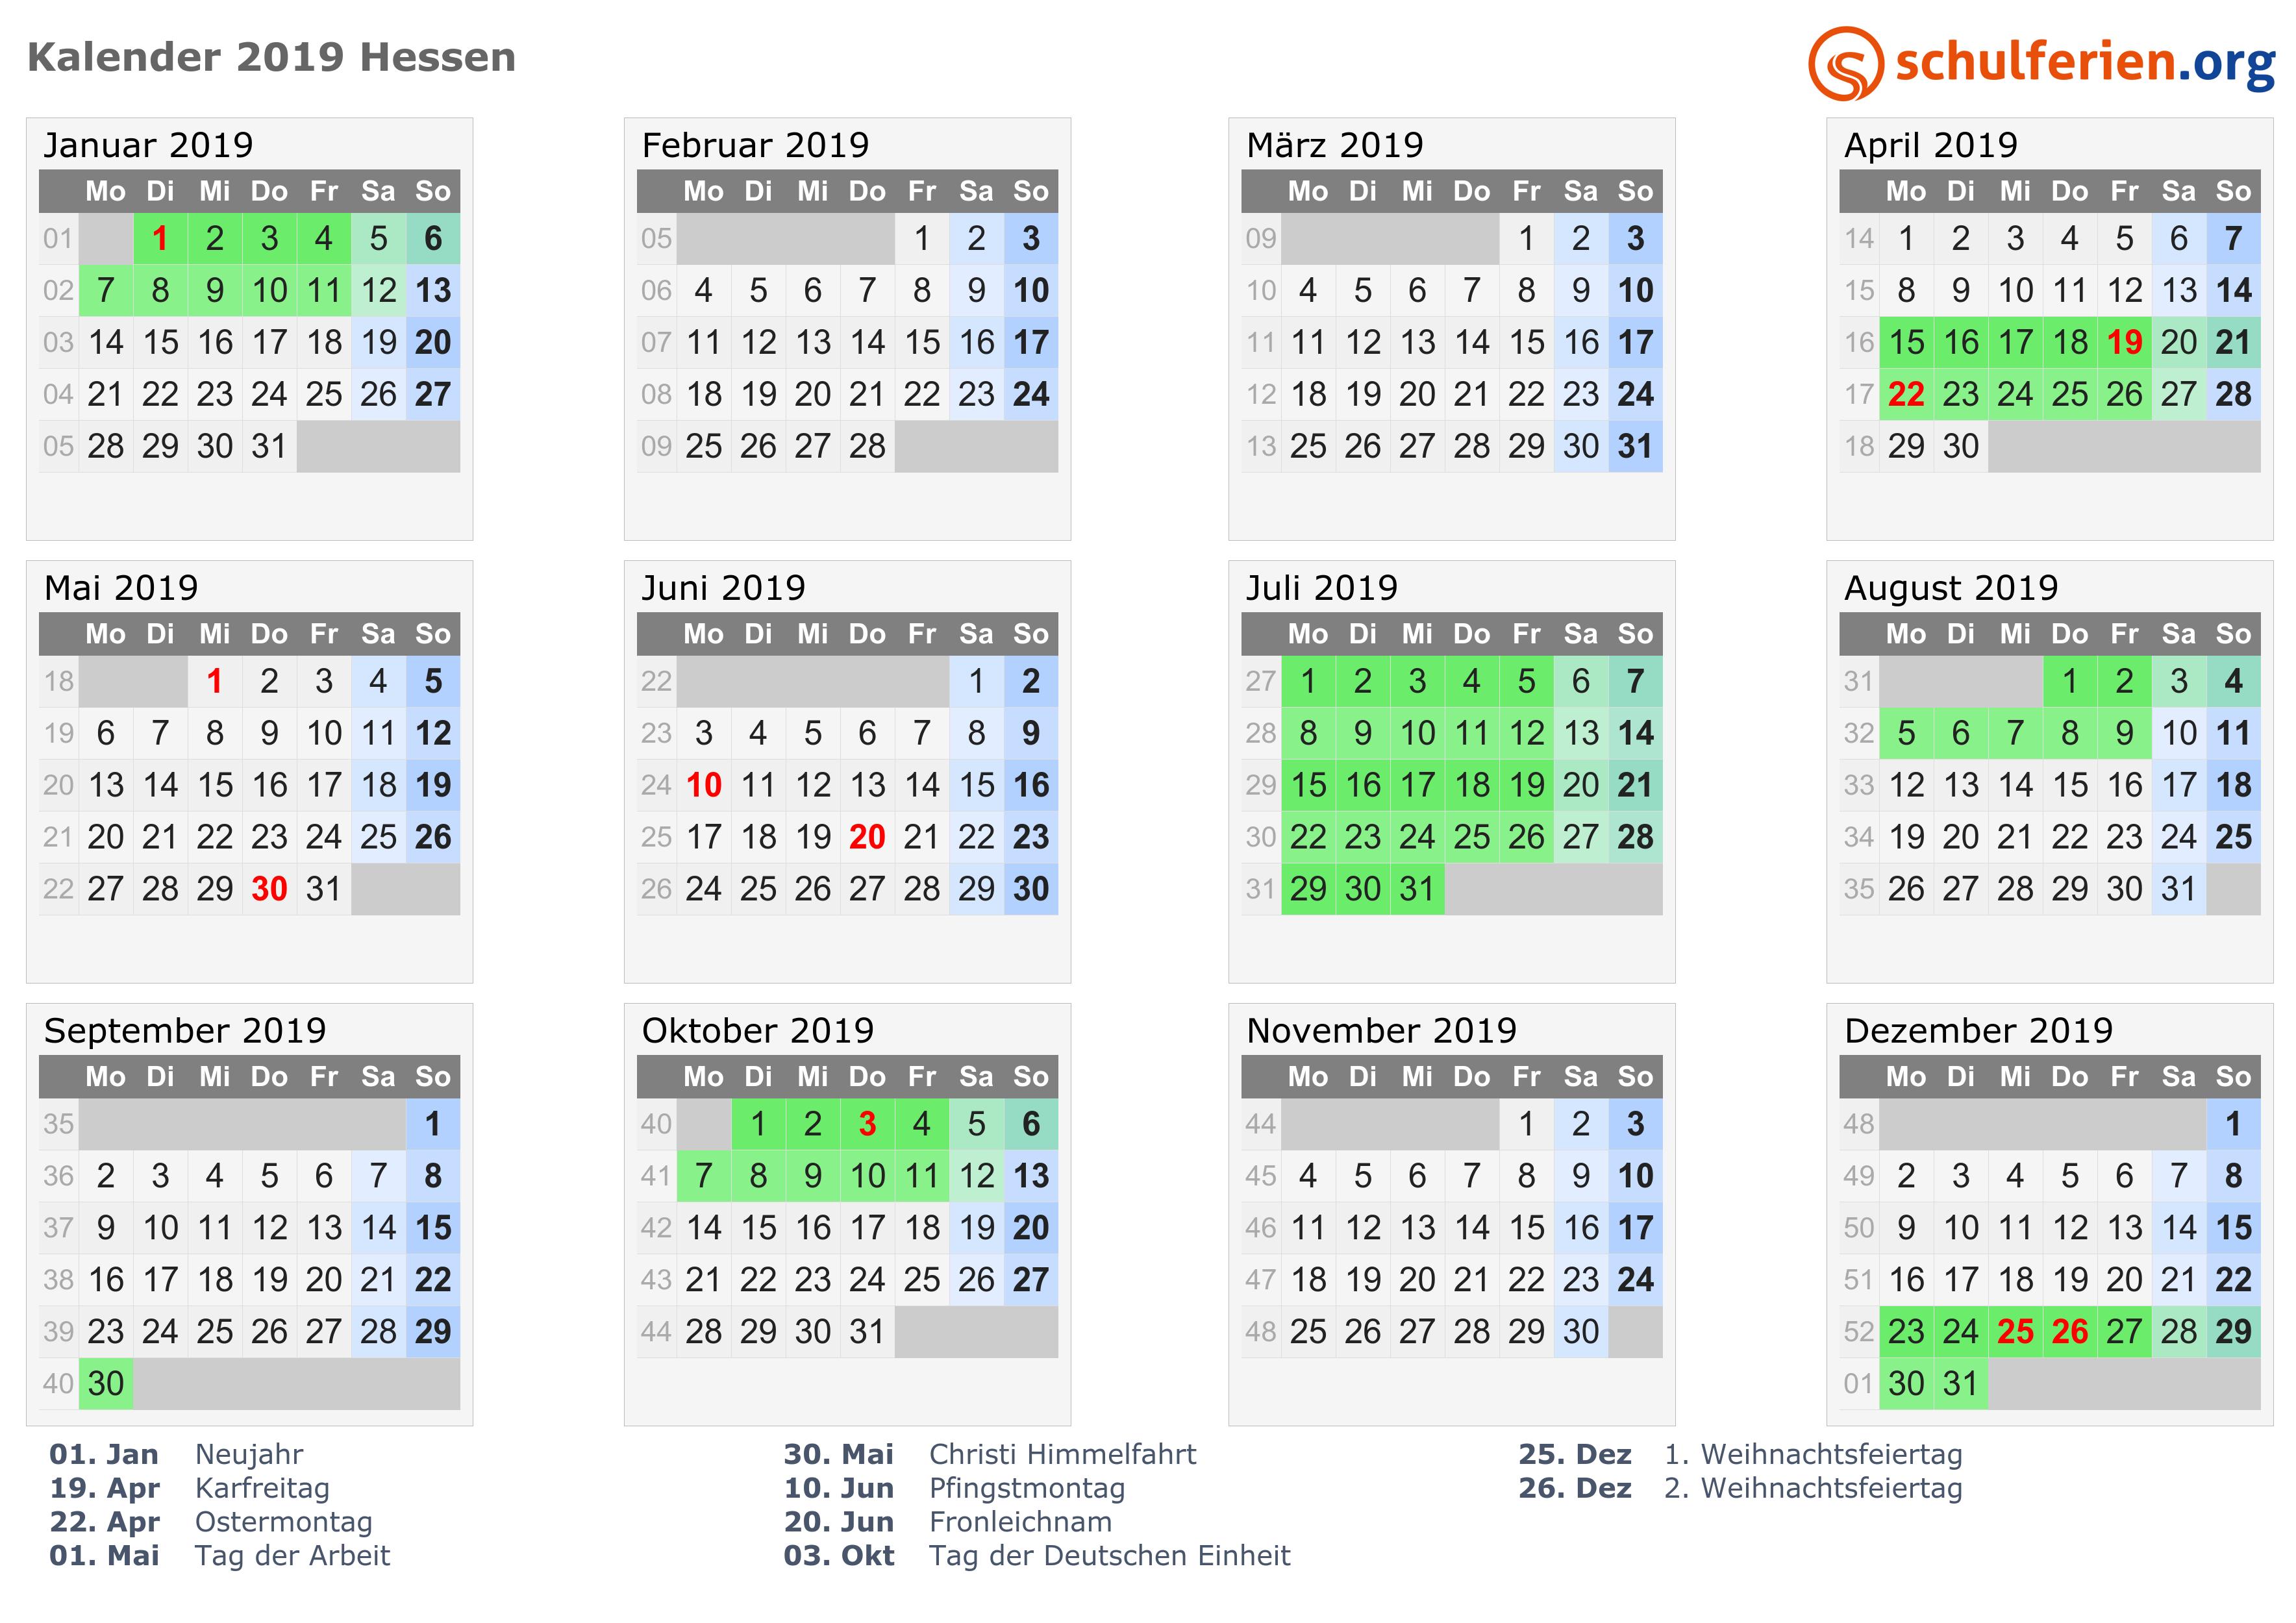 Kalender 2018 2019 Hessen